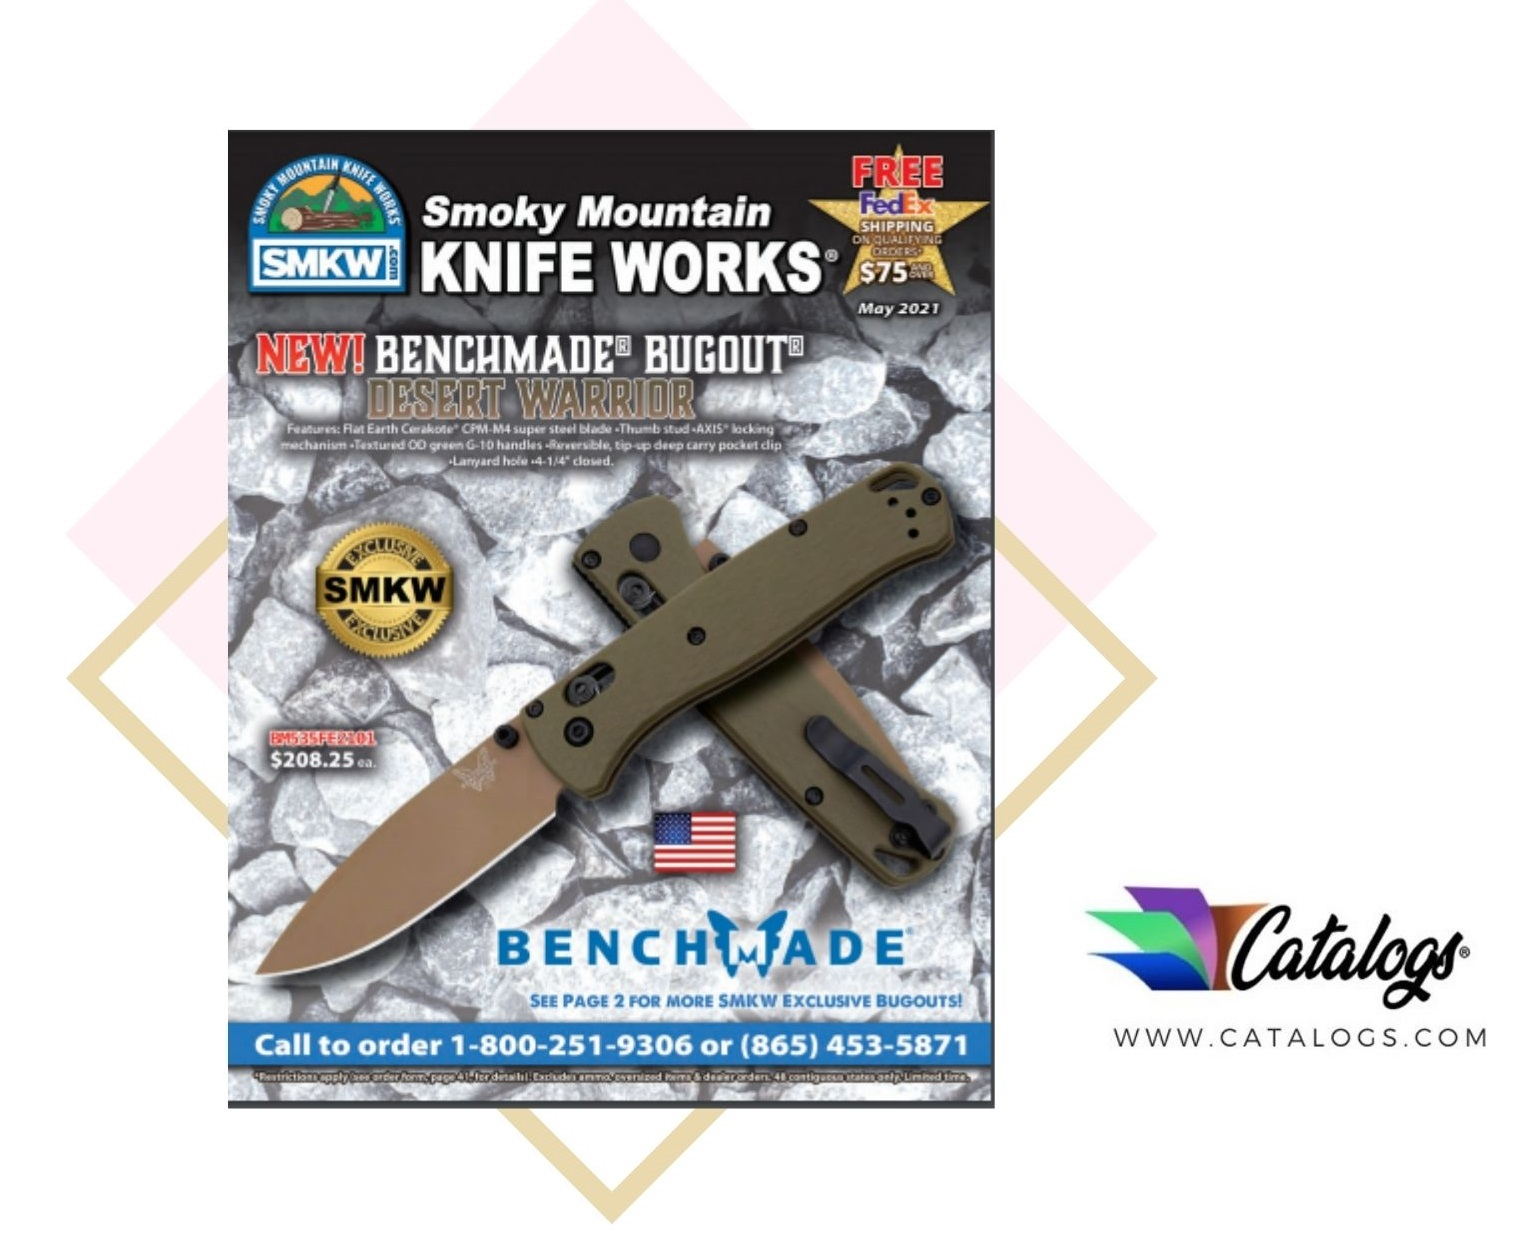 How Do I Order a Free Smoky Mountain Knife Works Gadgets Catalog?